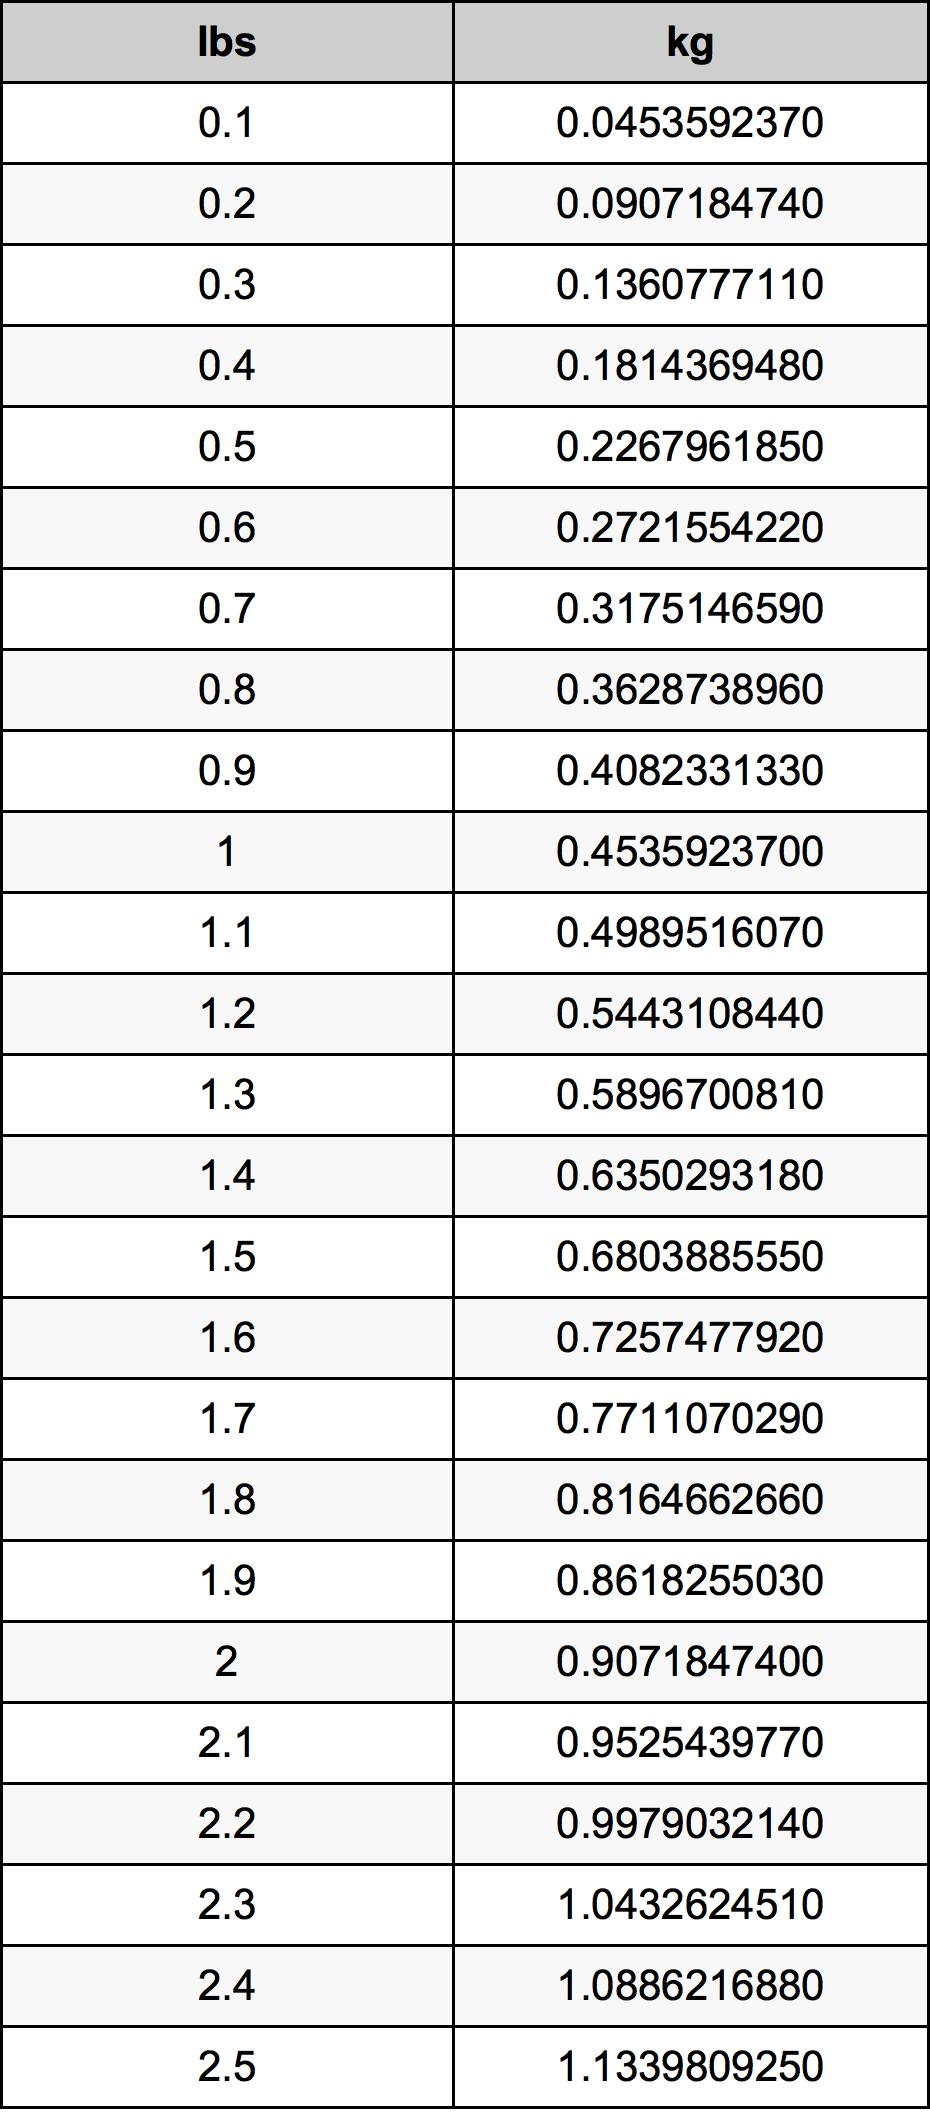 1.2 Libra konverteringstabellen